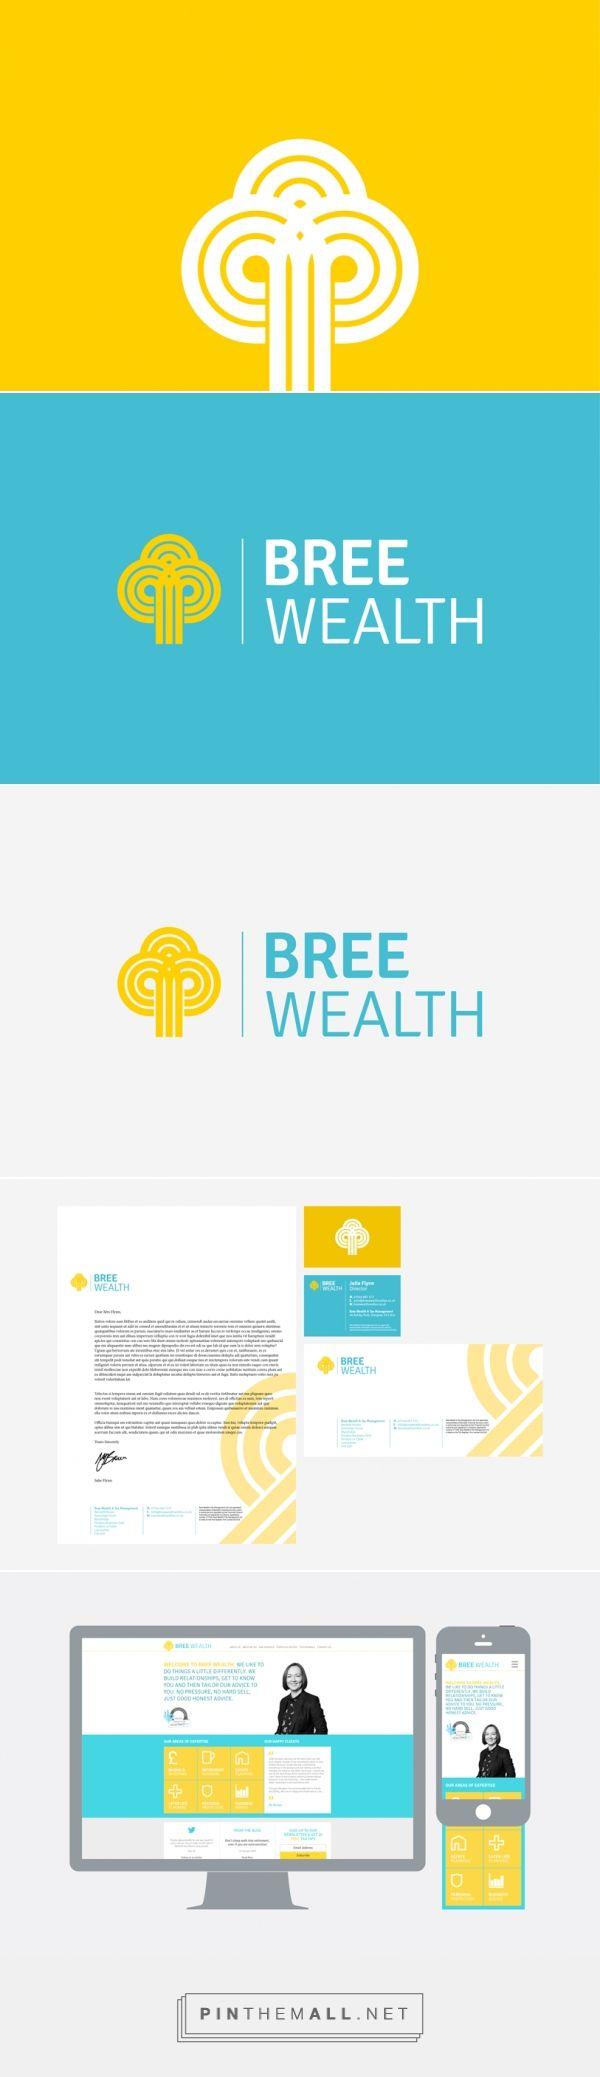 Bree Wealth Branding - The Design Attic - created via https://pinthemall.net